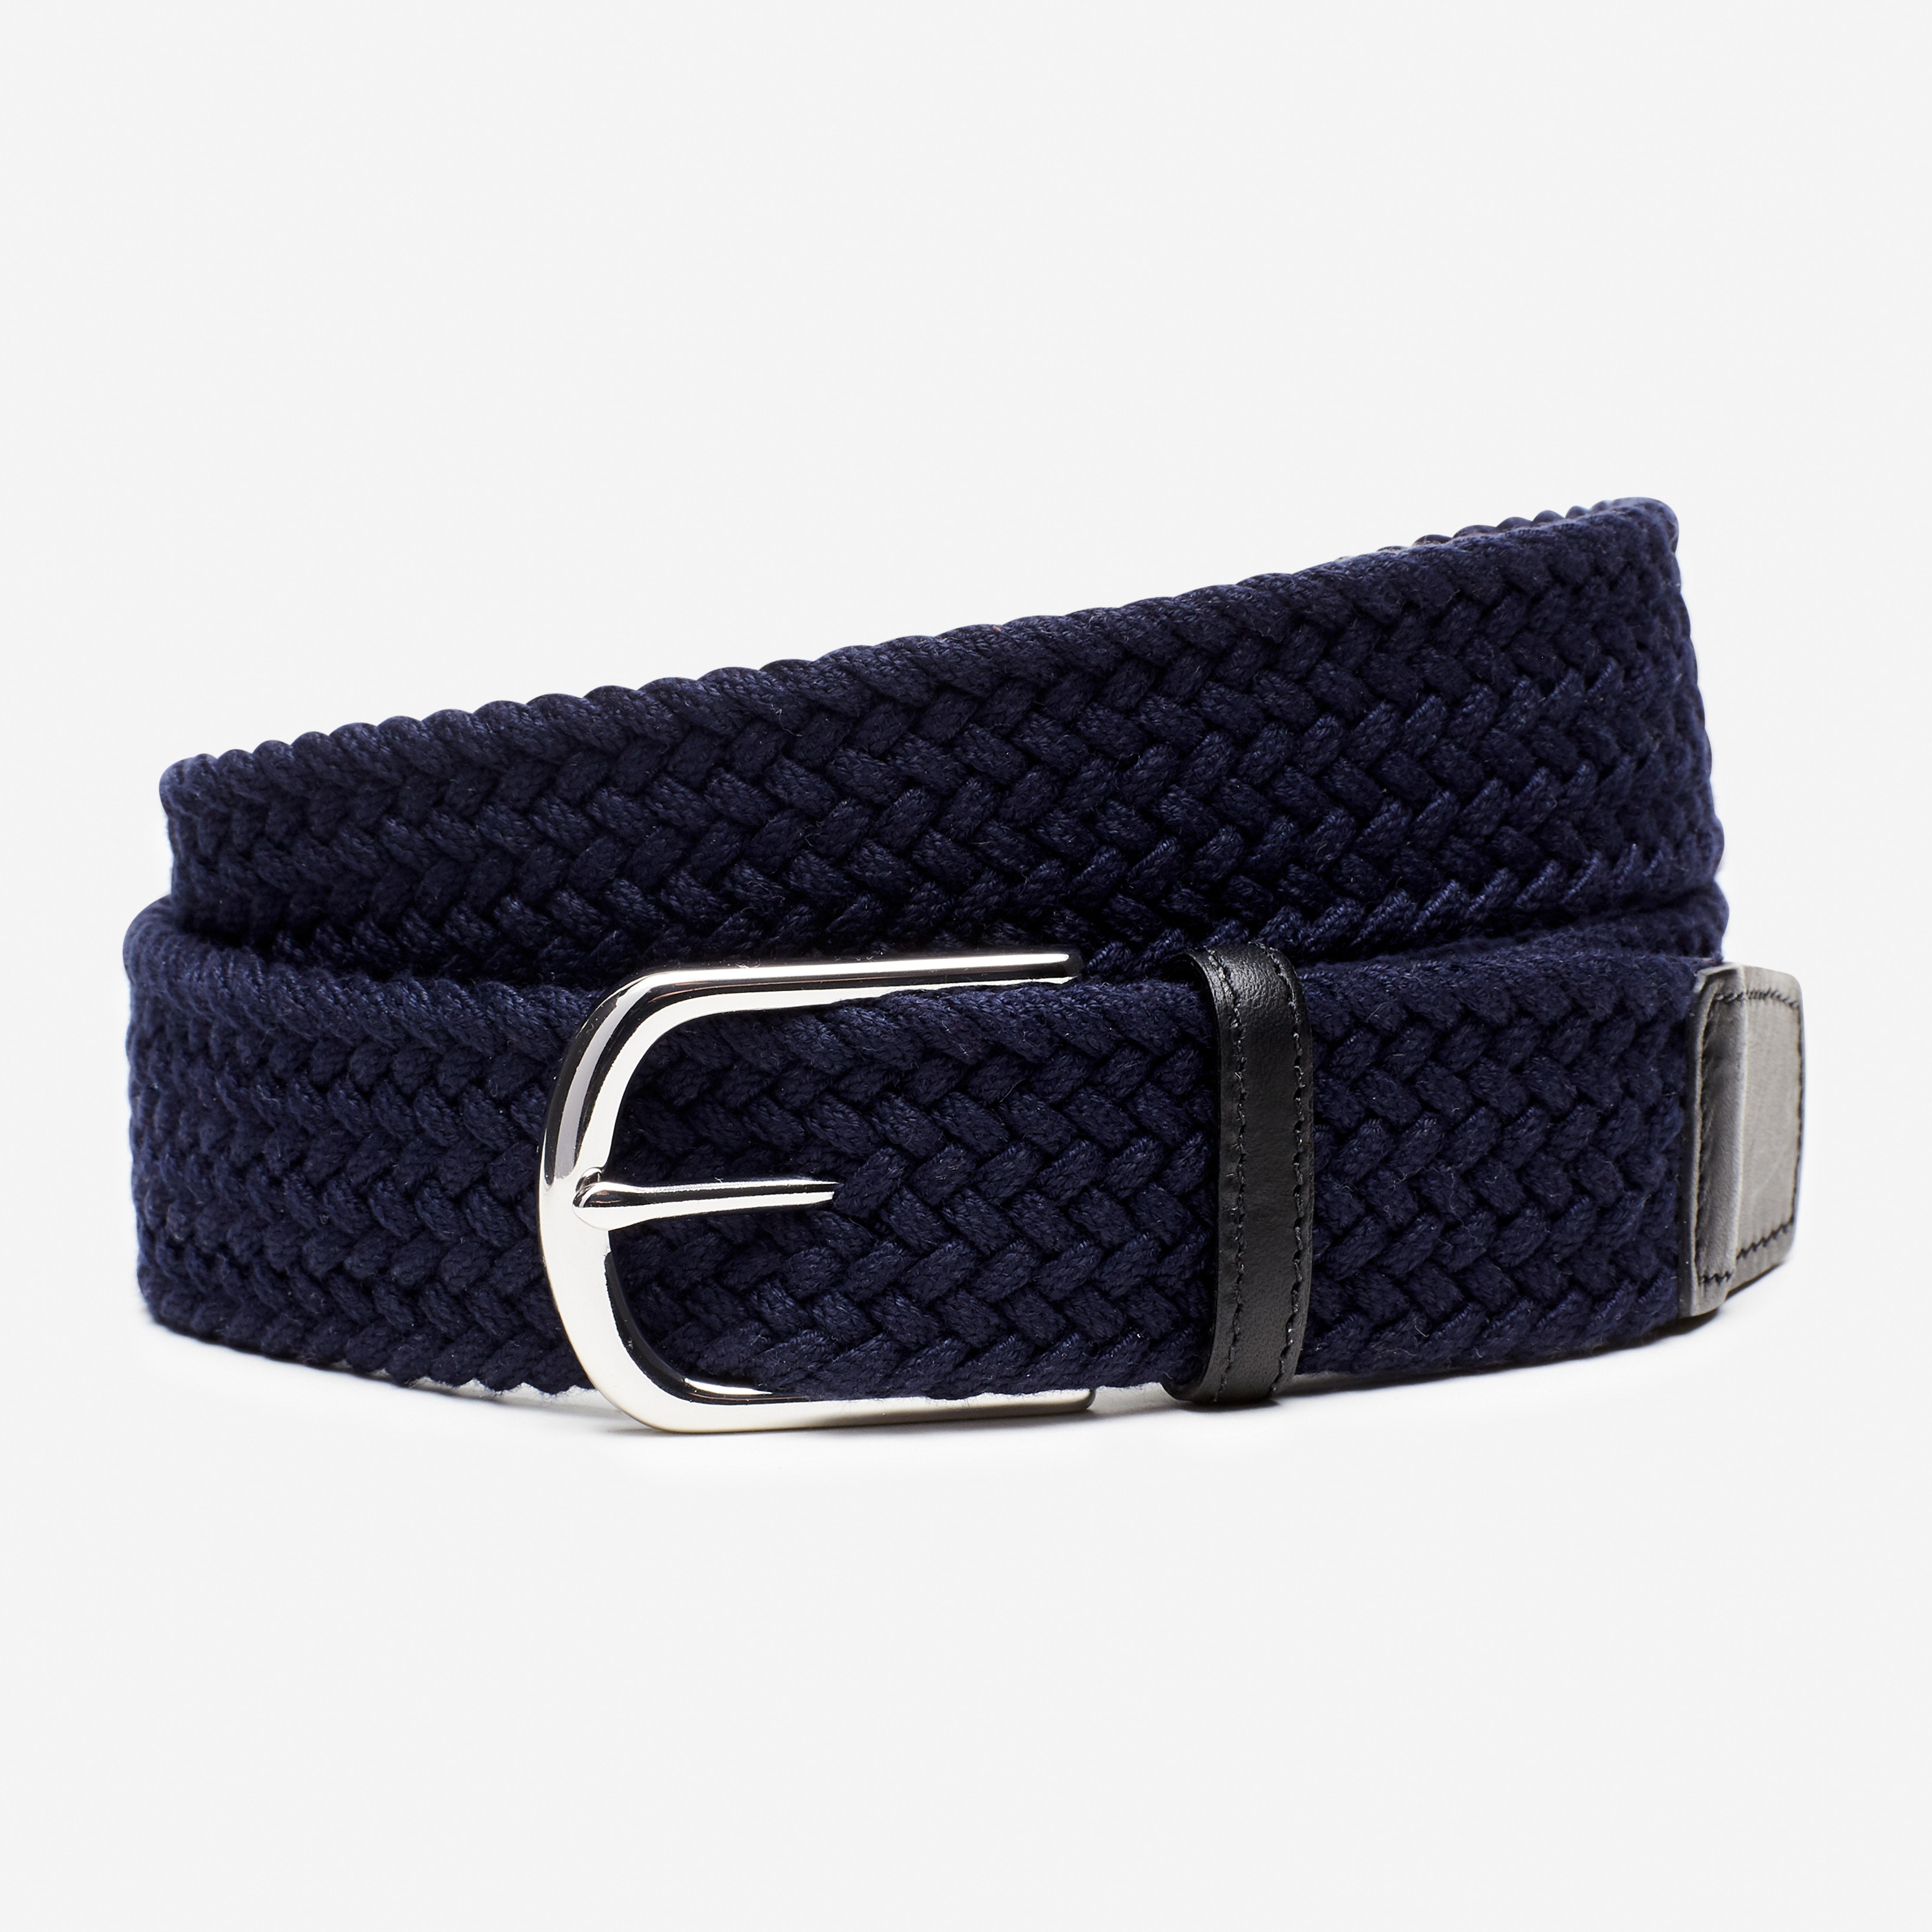 Casual Woven Belt